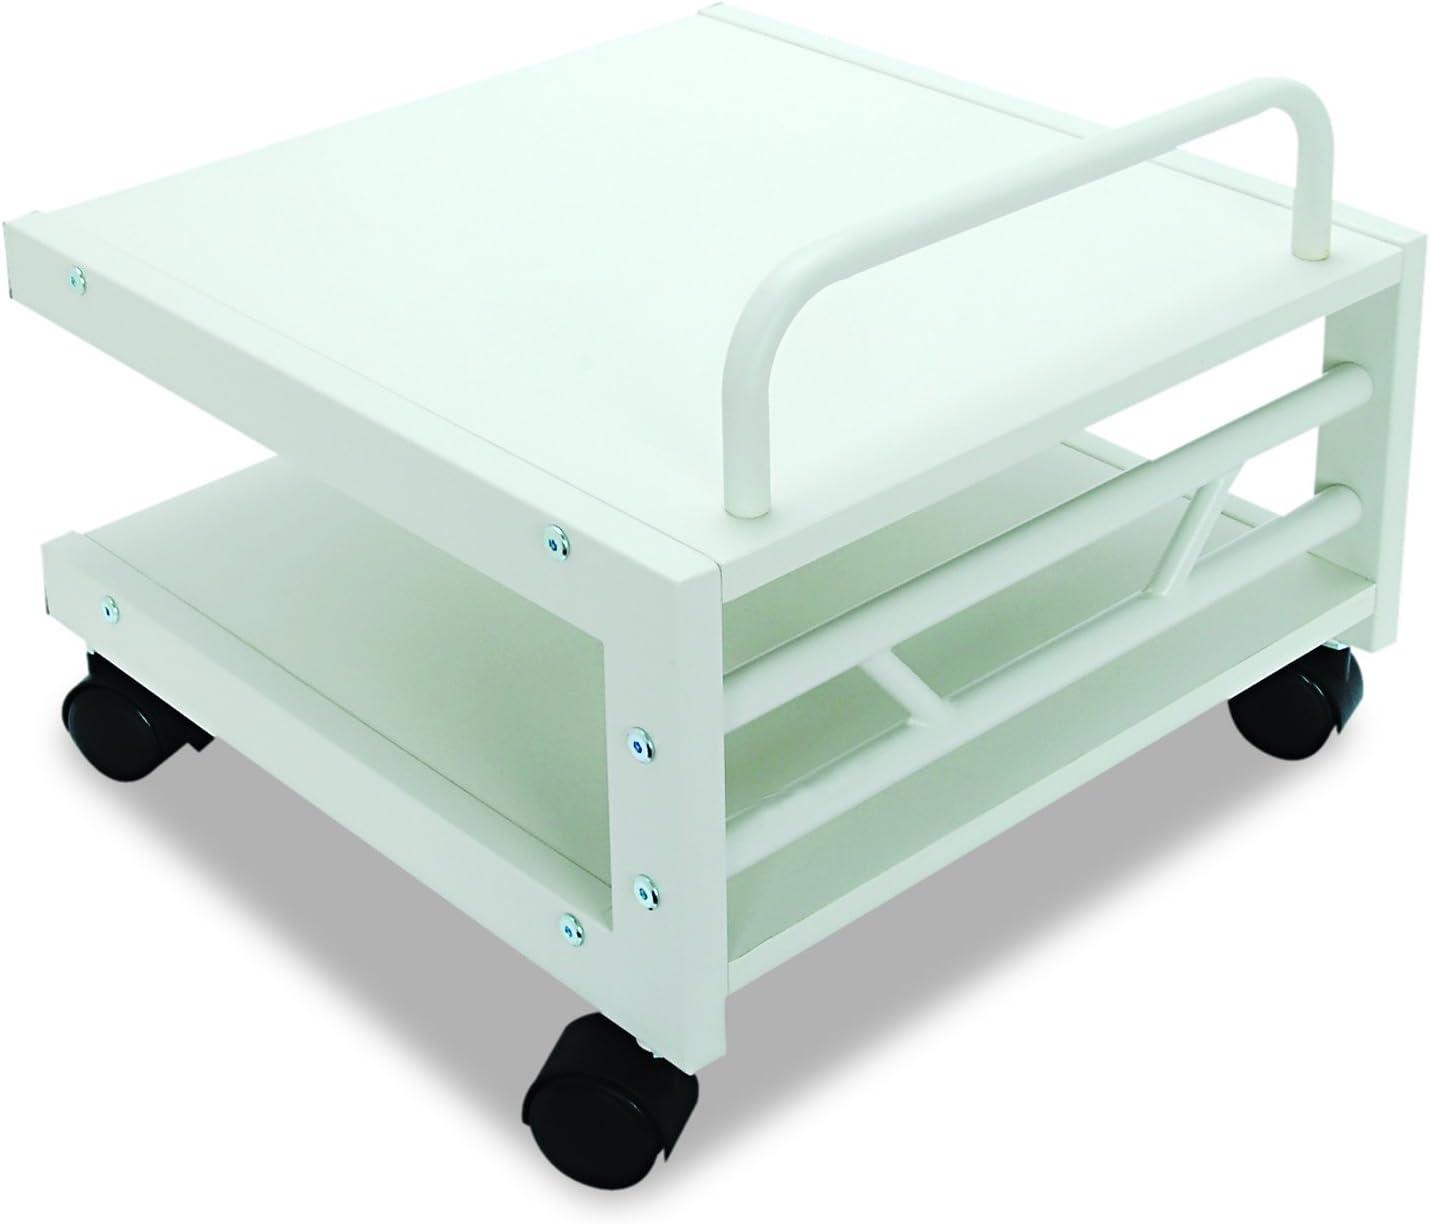 Balt Low Laser Printer Stand, 27501, 14''H x 17''W x 17''D, Brushed silver steel frame, Gray laminate shelves: Home & Kitchen